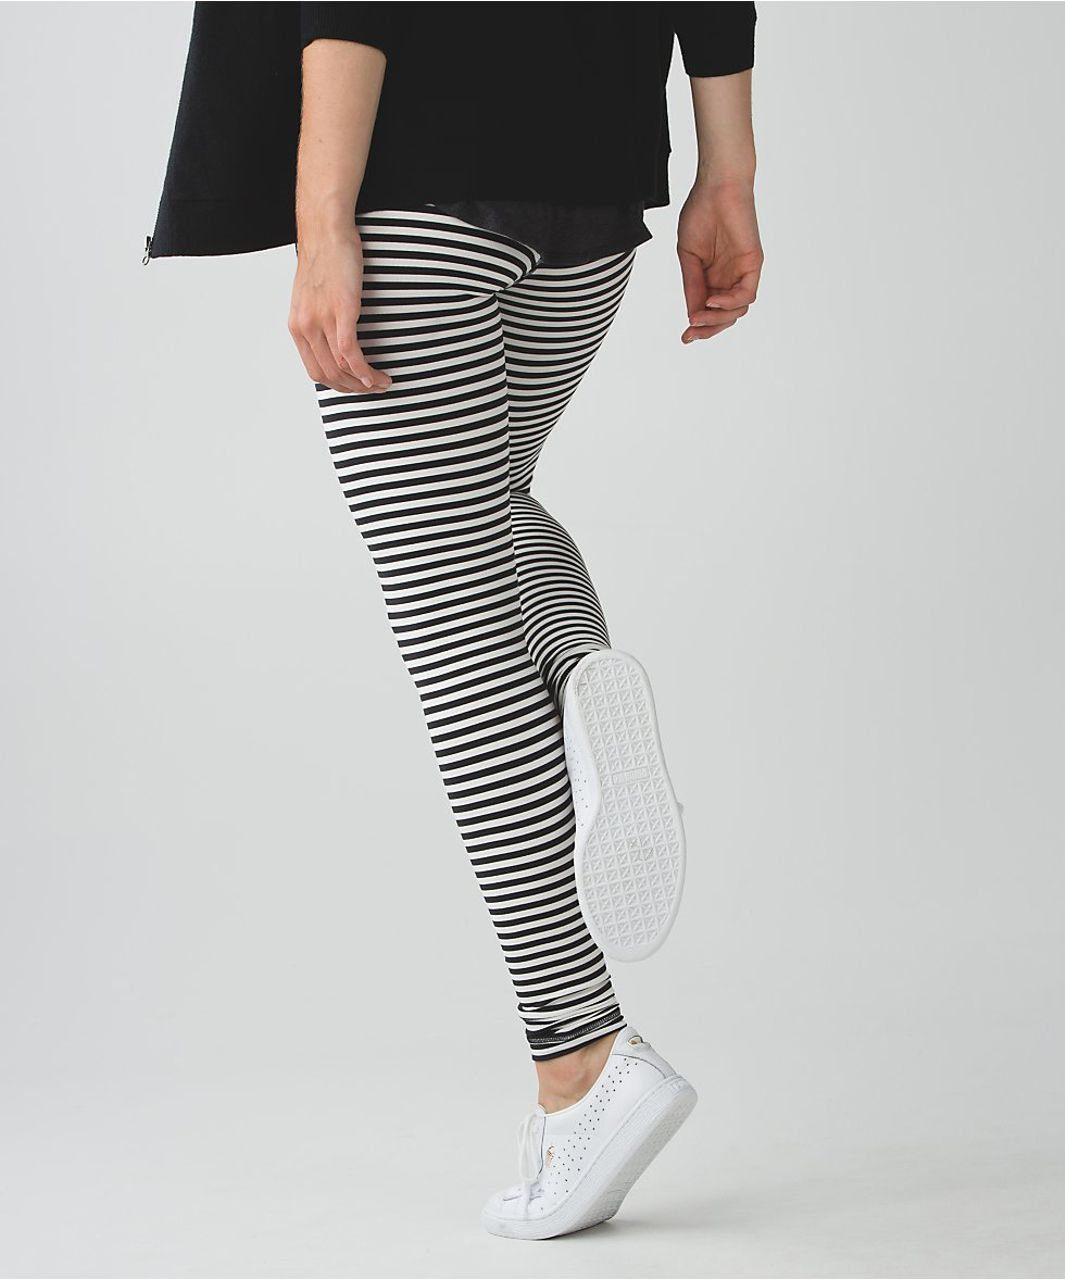 Lululemon Wunder Under Pant - Narrow Bold Stripe Black Angel Wing / Grapefruit